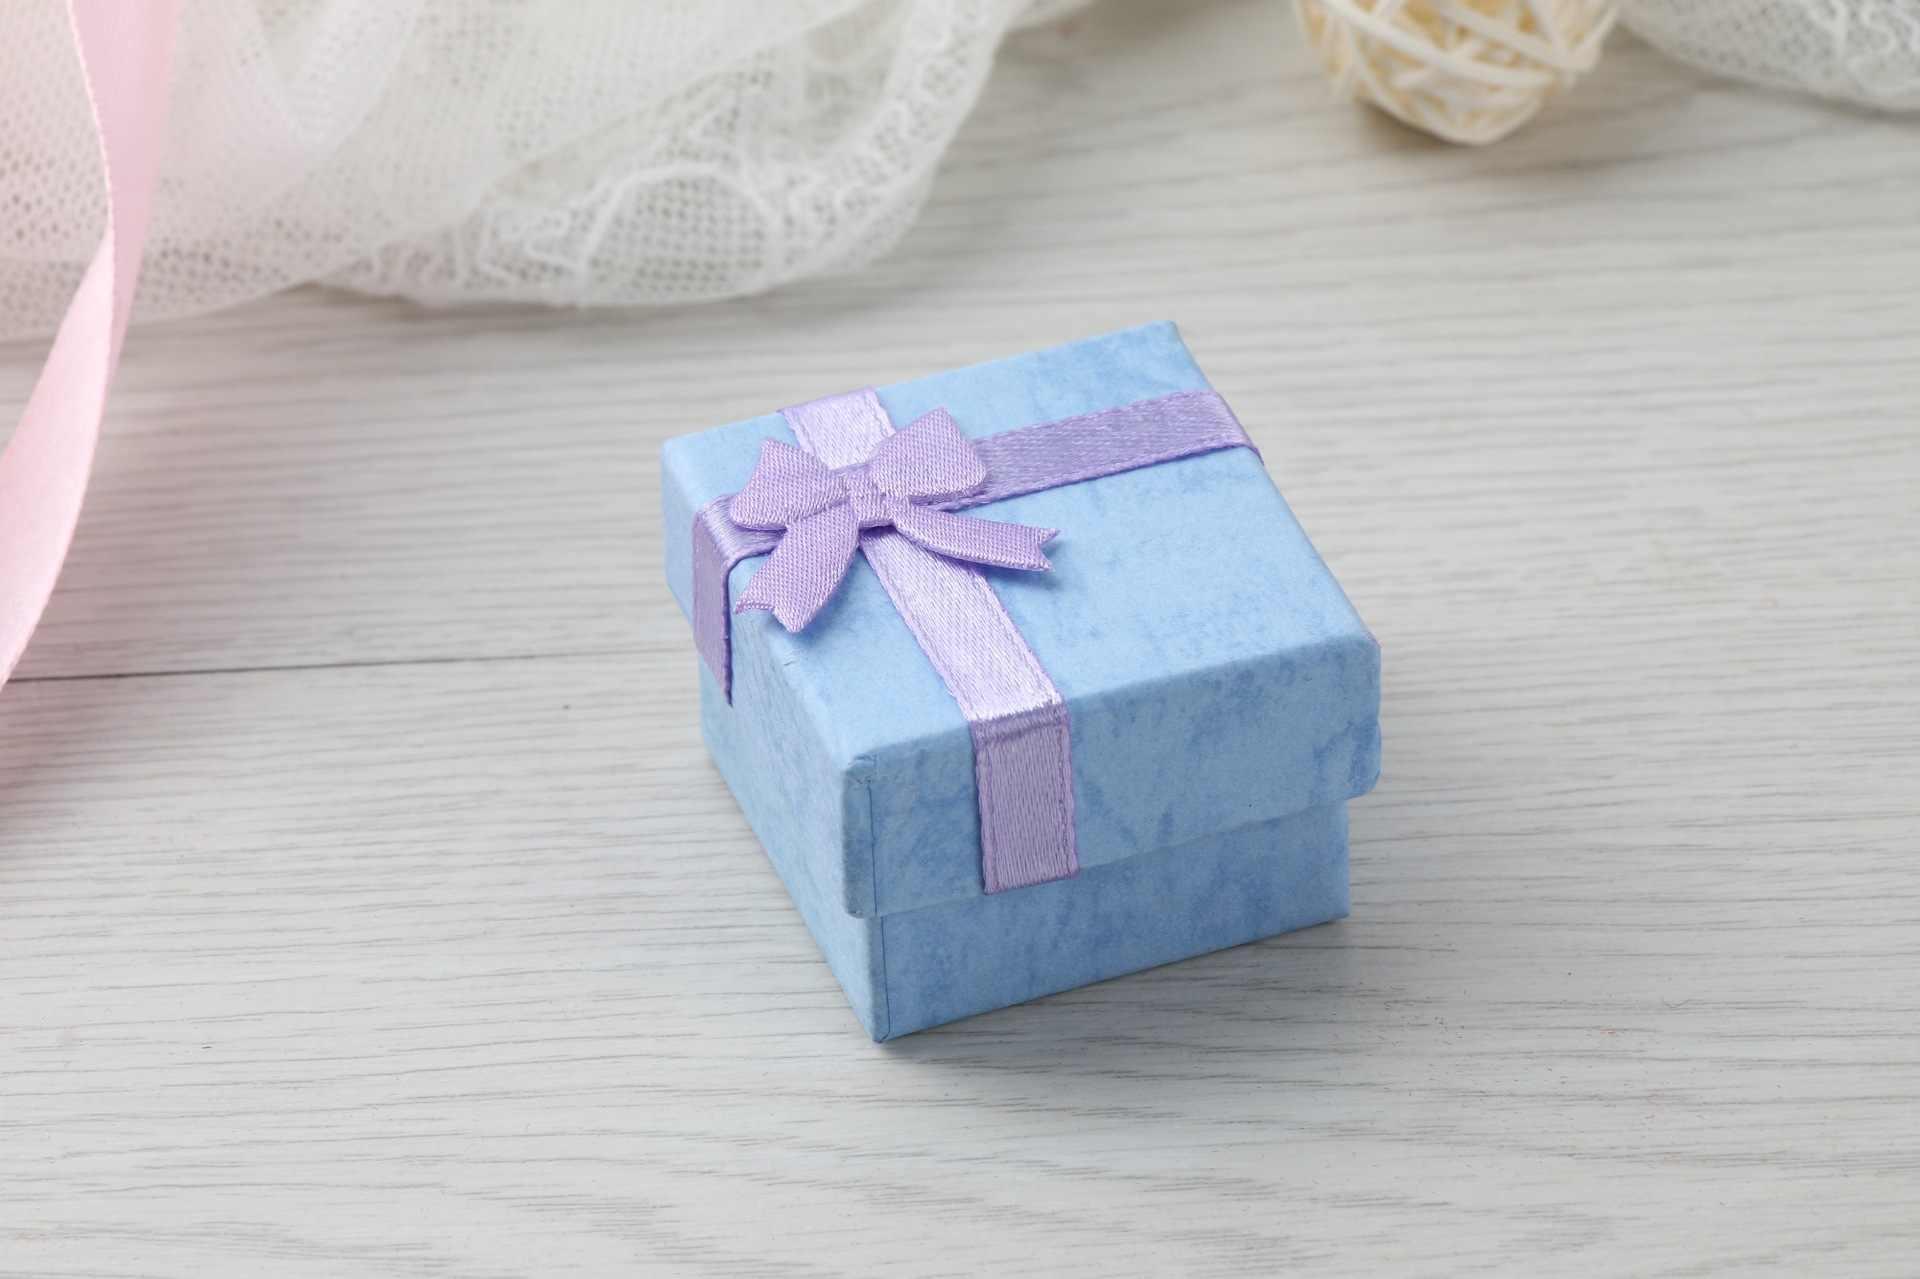 2 Pcs Kalung Anting-Anting Cincin Kemasan Perhiasan Kotak Hadiah Kertas Aksesoris Kertas Kemasan Tas untuk Hadiah Cajas De Regalo